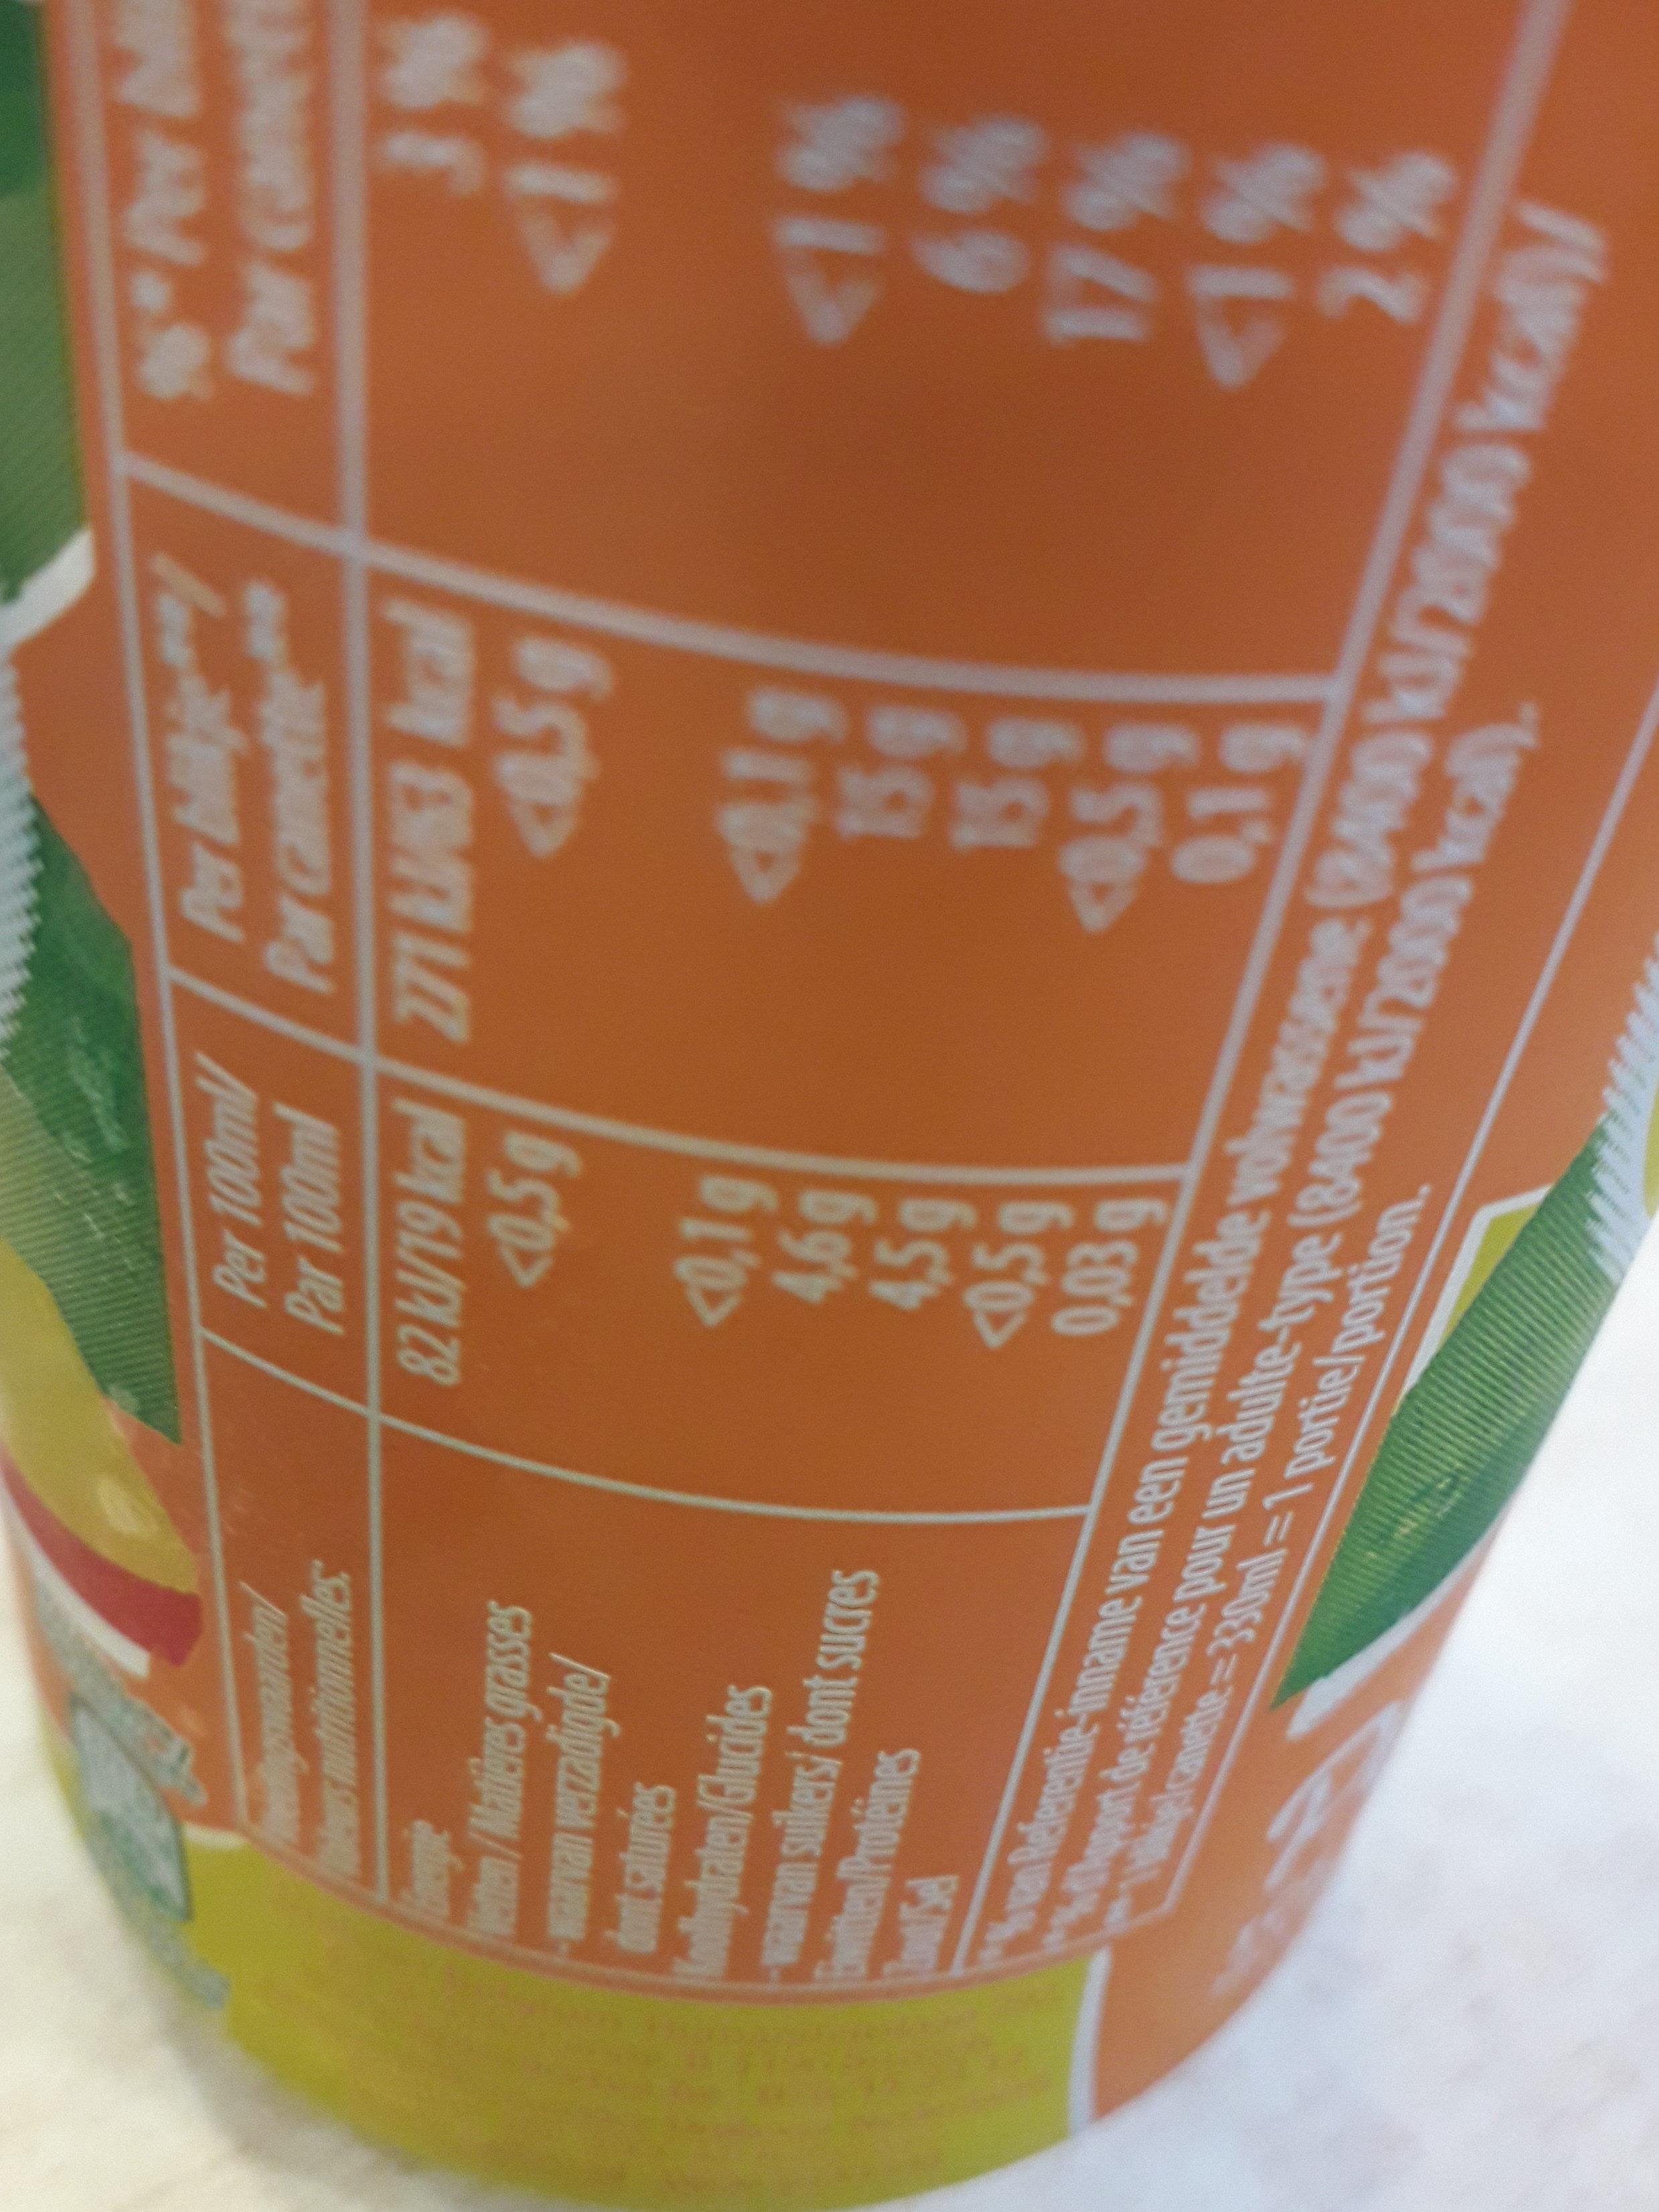 Lipton Ice Tea -peach - No Bubbles - Product - fr